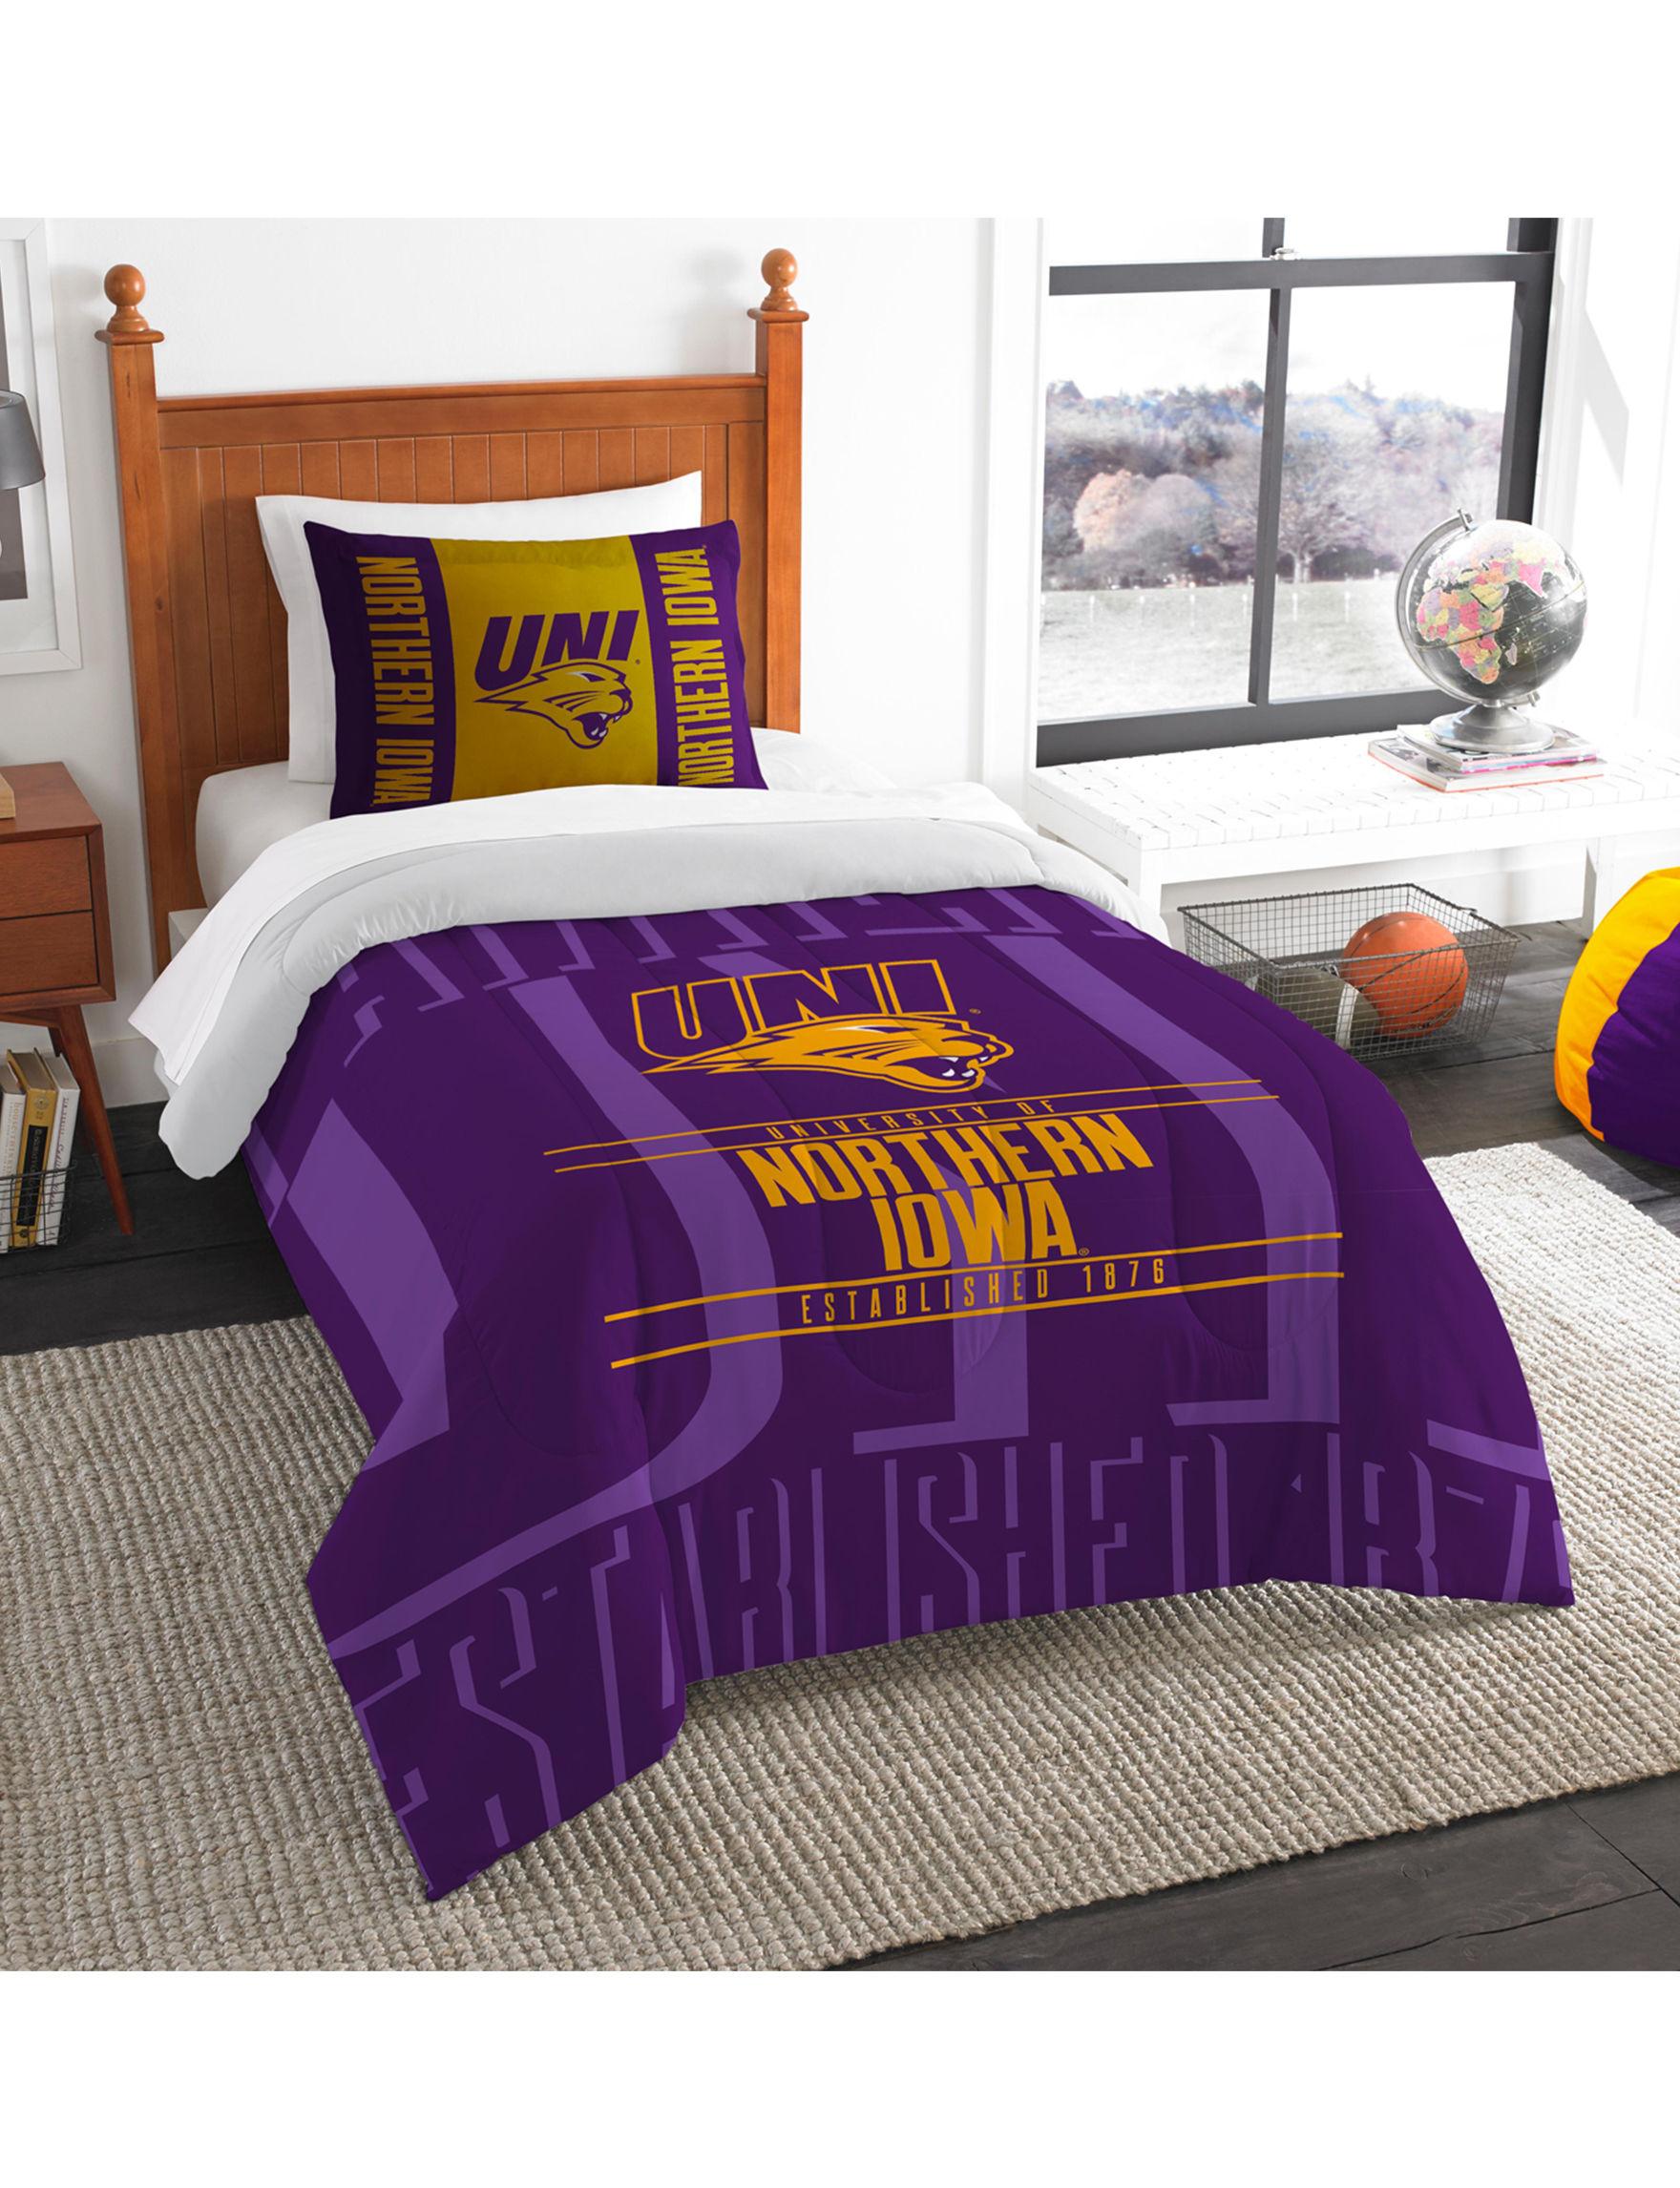 The Northwest Company Purple / Gold Comforters & Comforter Sets